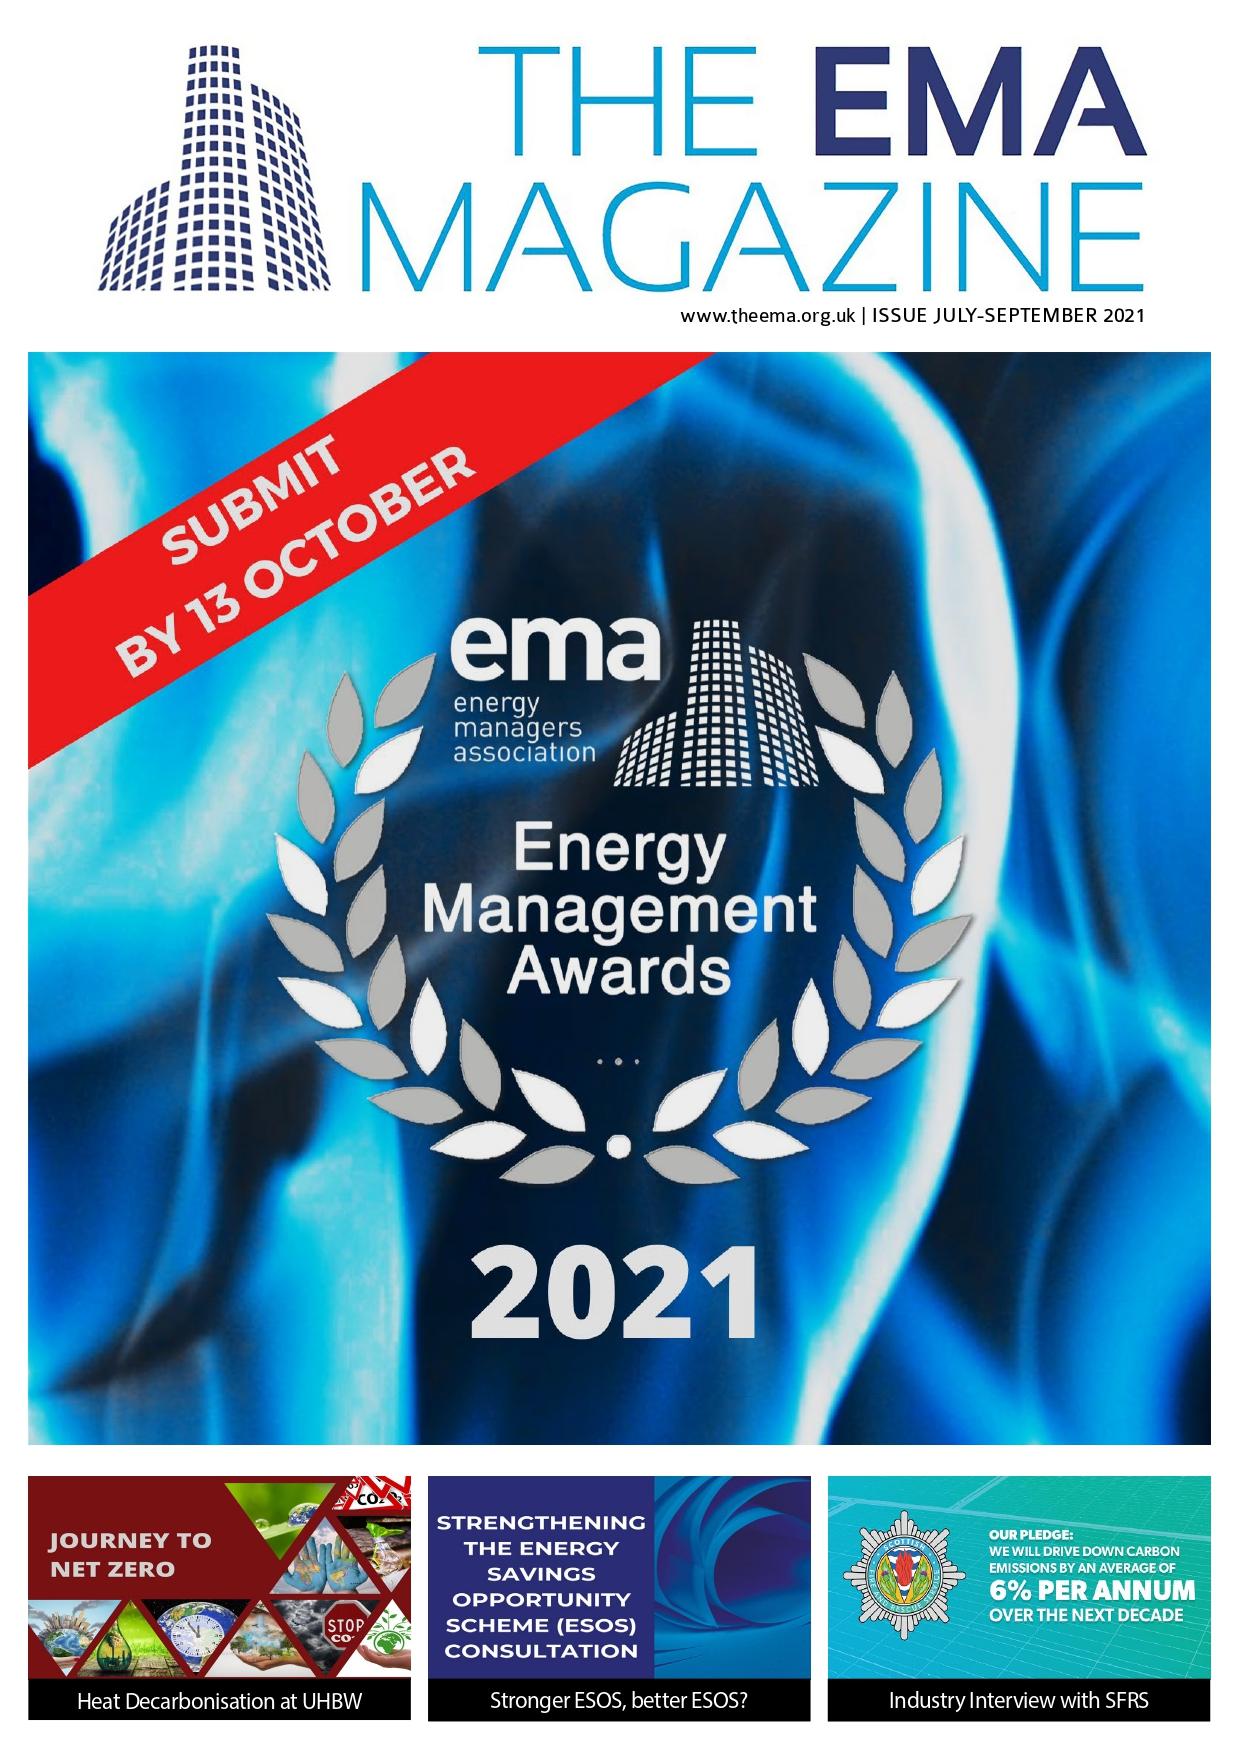 Ema Magazine Jul Sep 2021 Front Cover